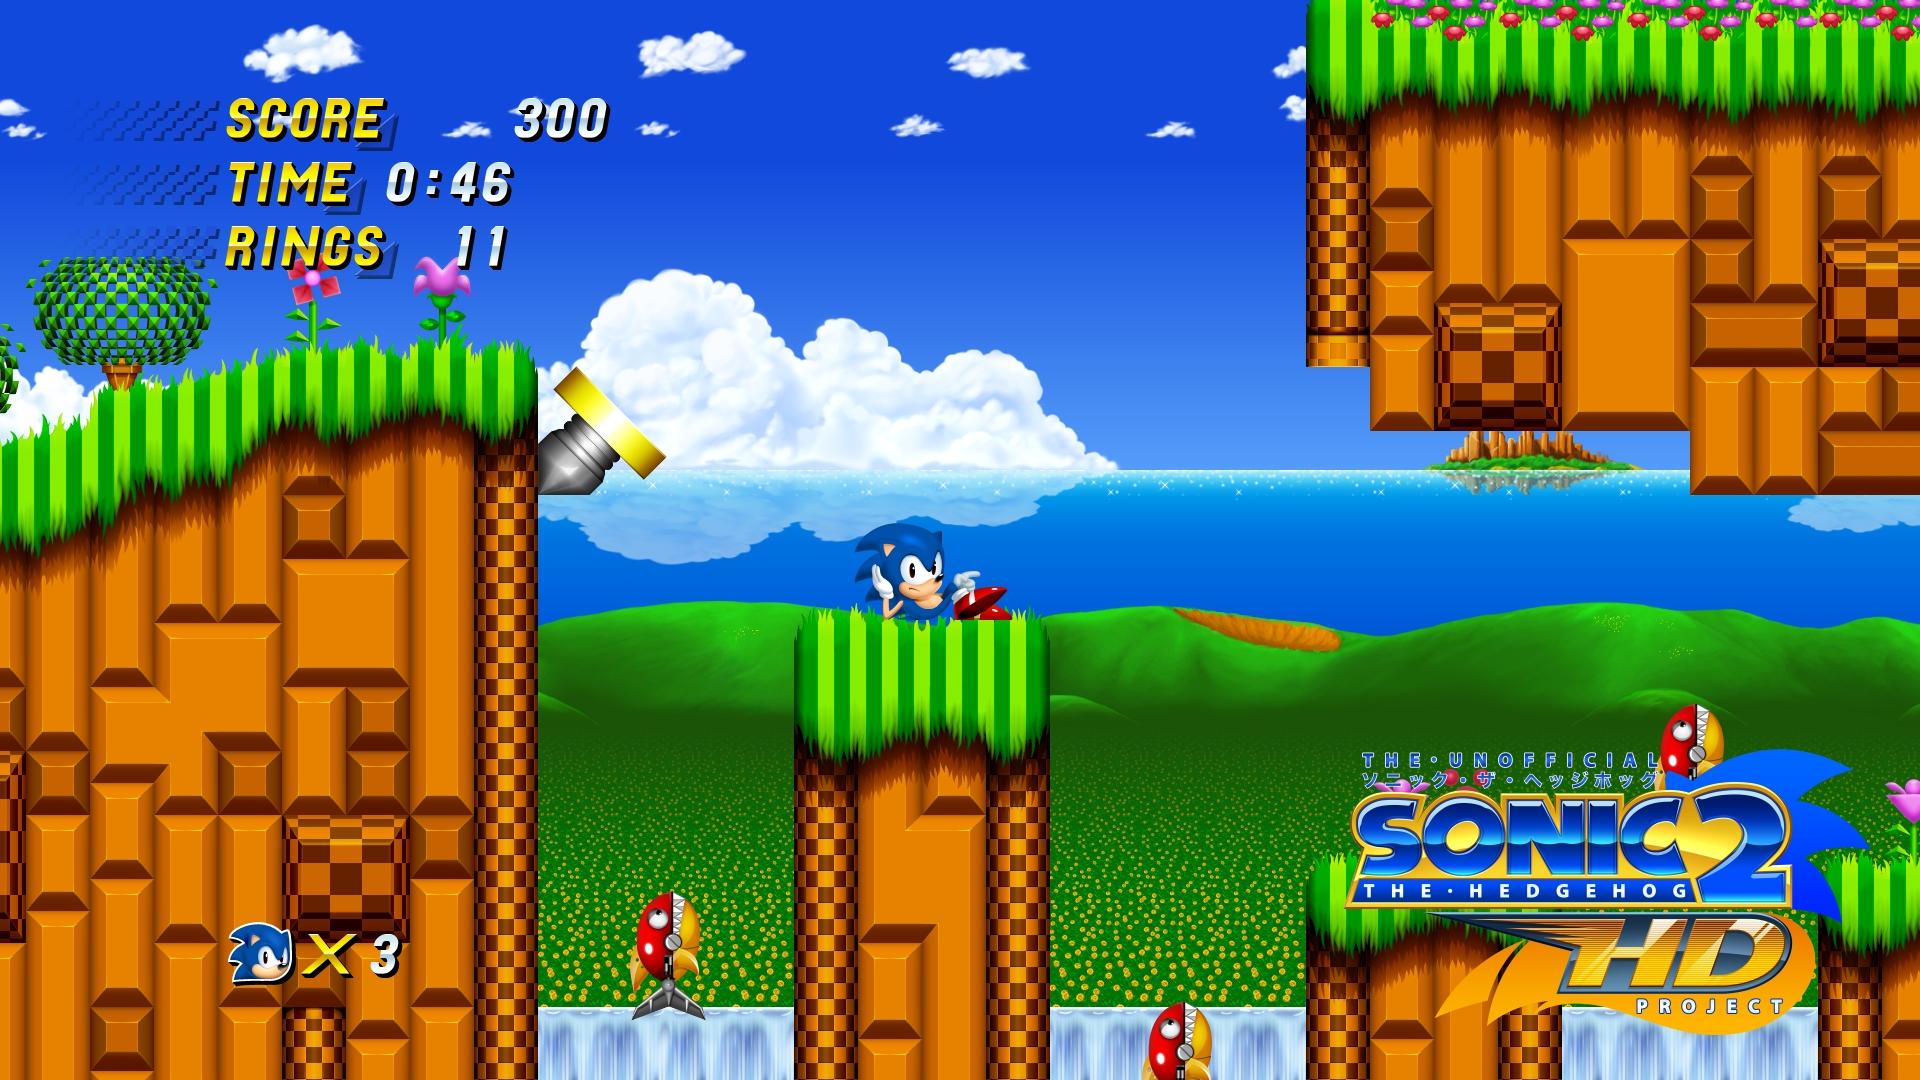 Sonic2 Hd